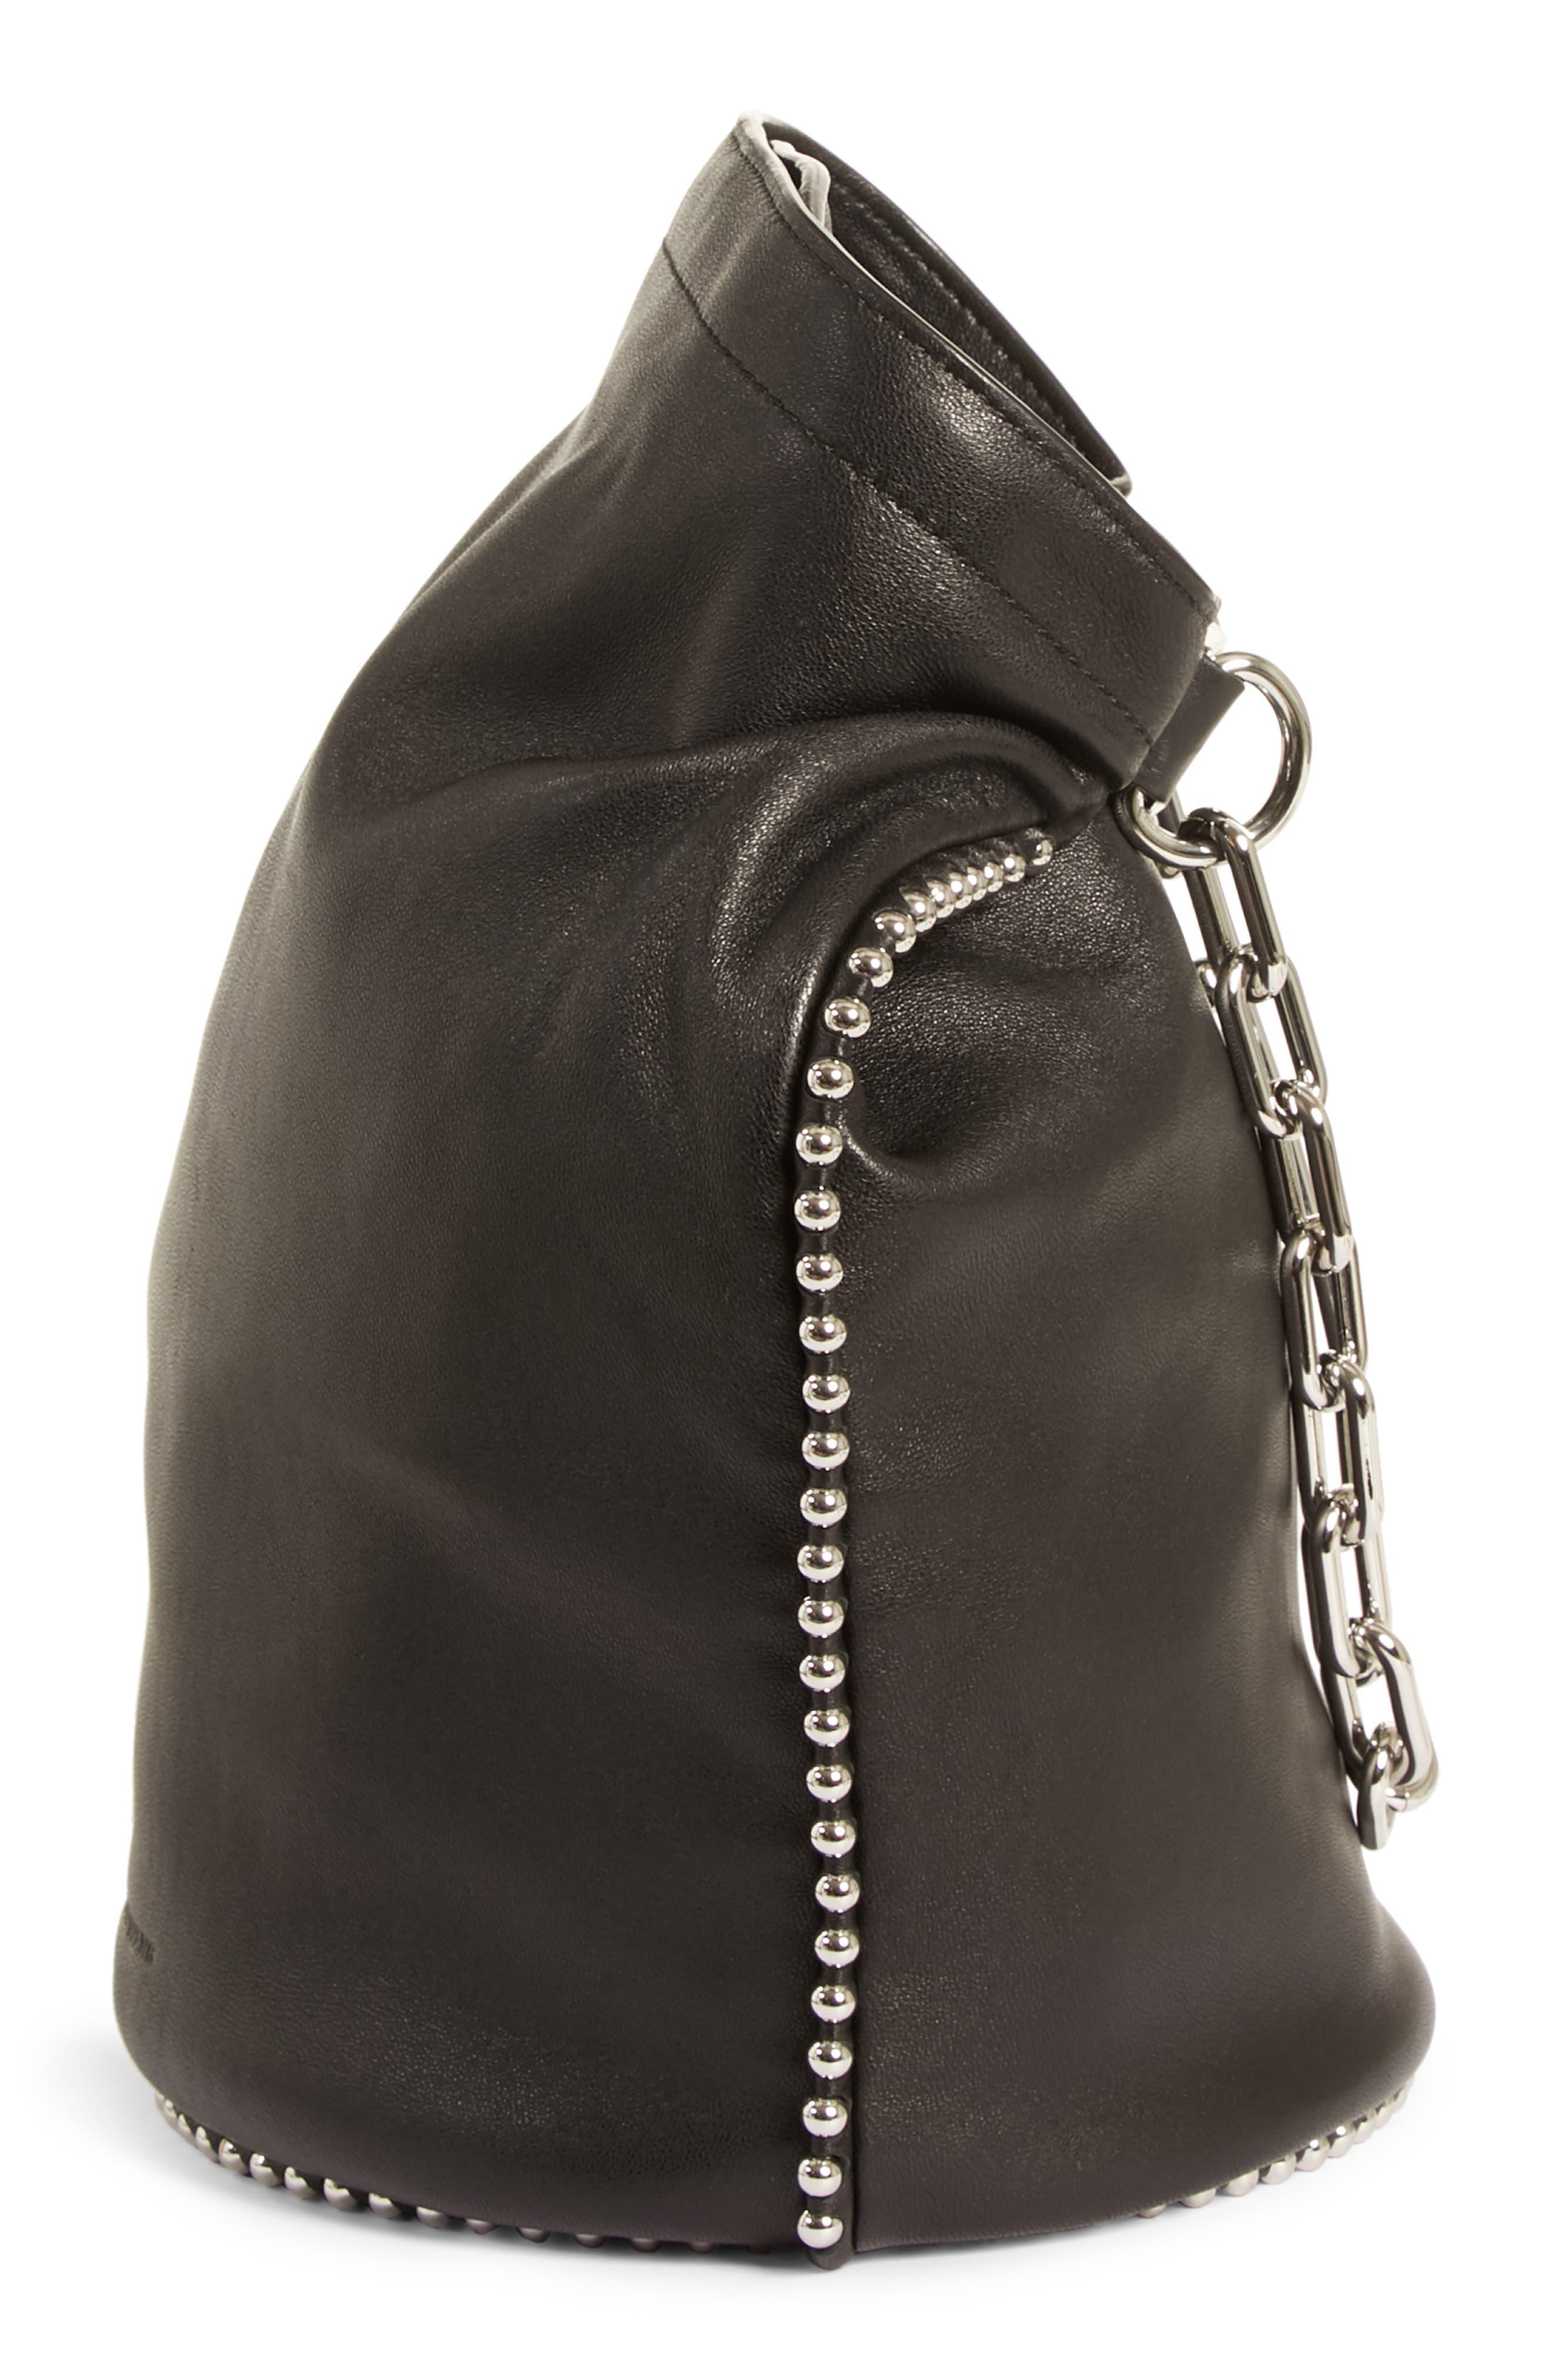 Attica Dry Sack Leather Bucket Bag,                             Alternate thumbnail 6, color,                             BLACK